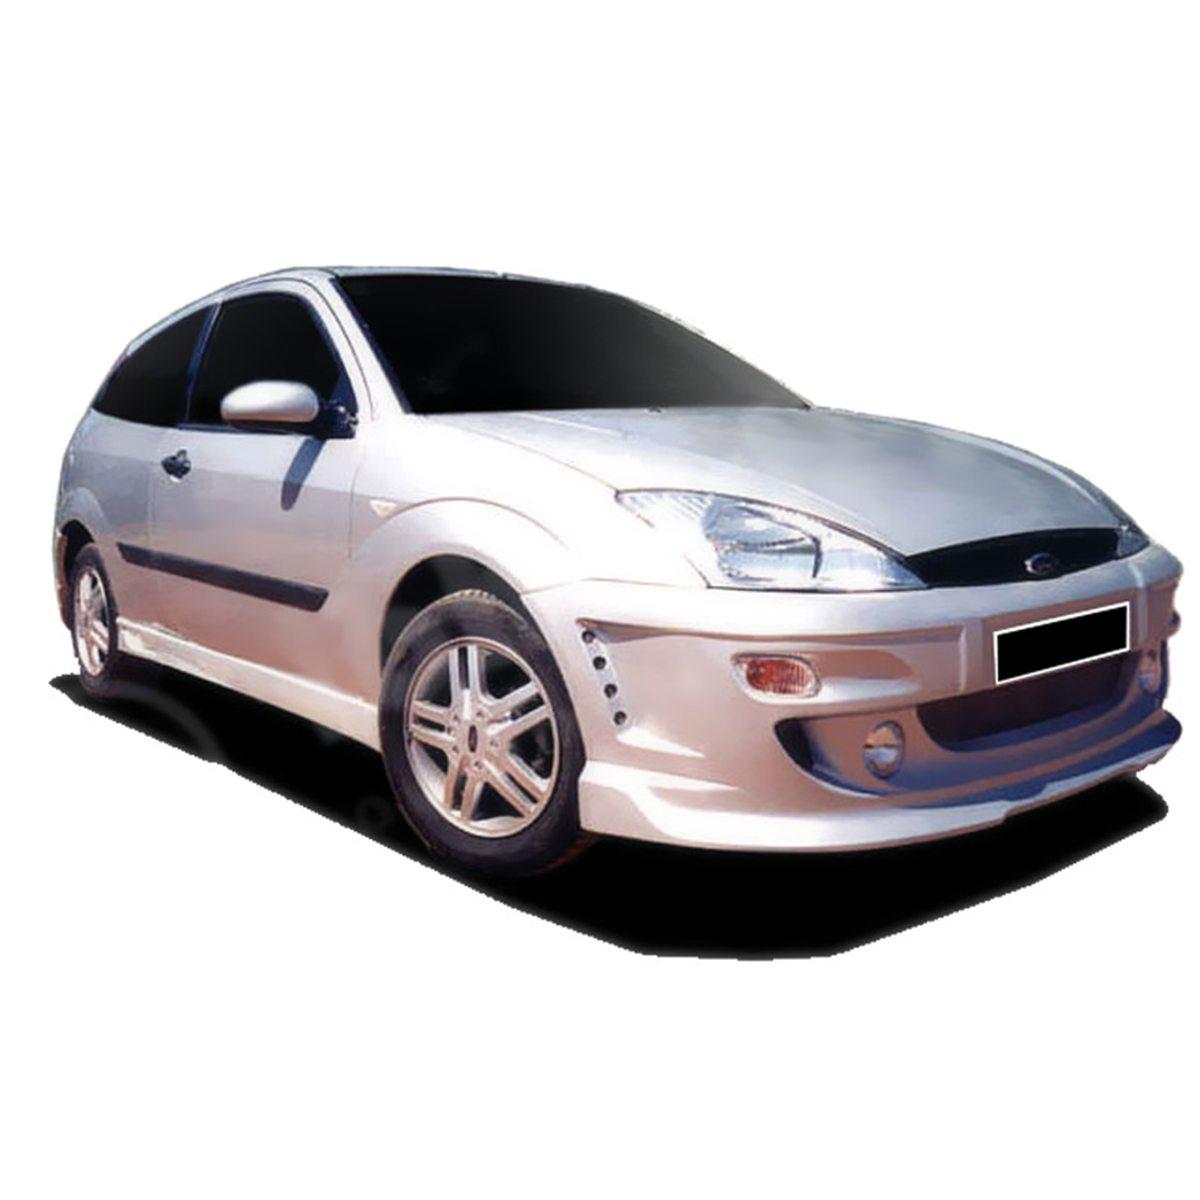 Ford-Focus-Aqua-Wide-frt-PCA033